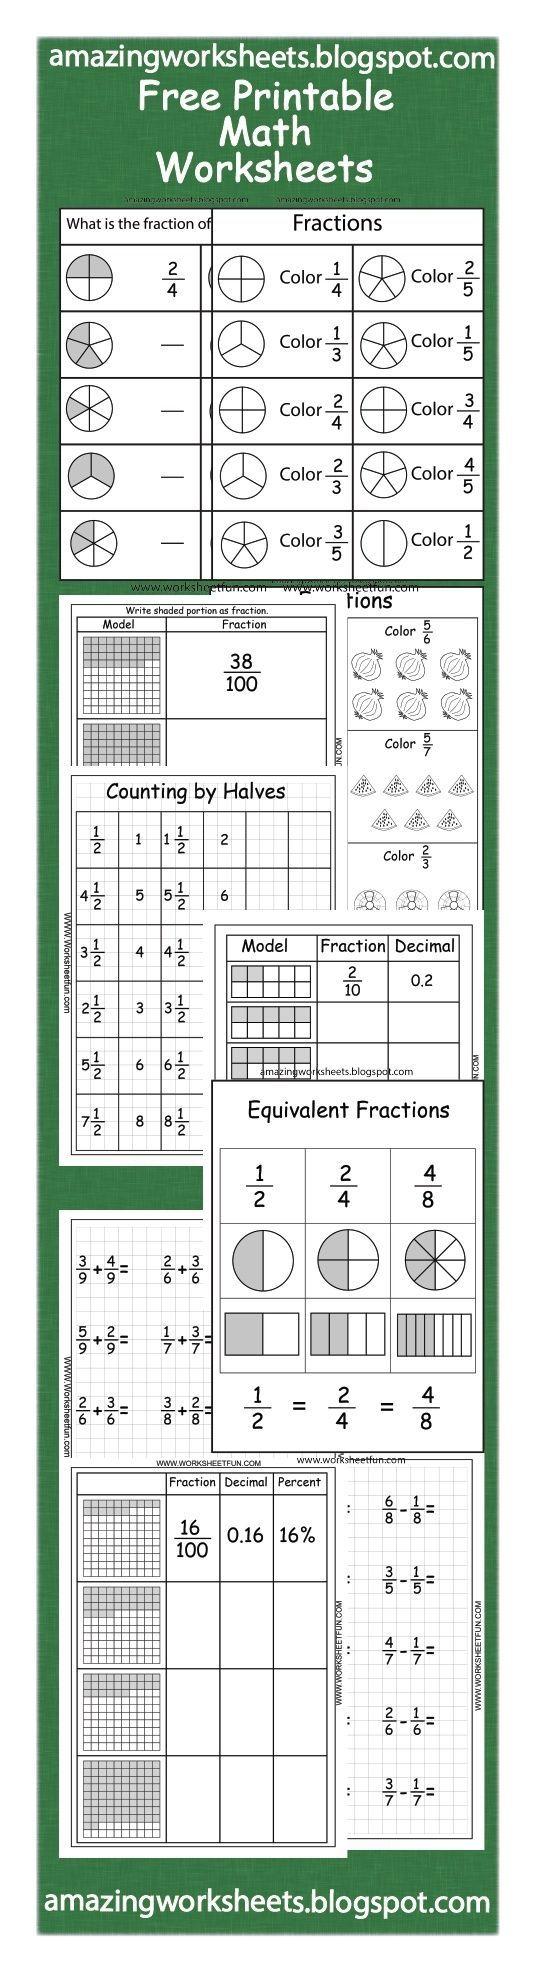 Free Printable Fractions Worksheets by valeria